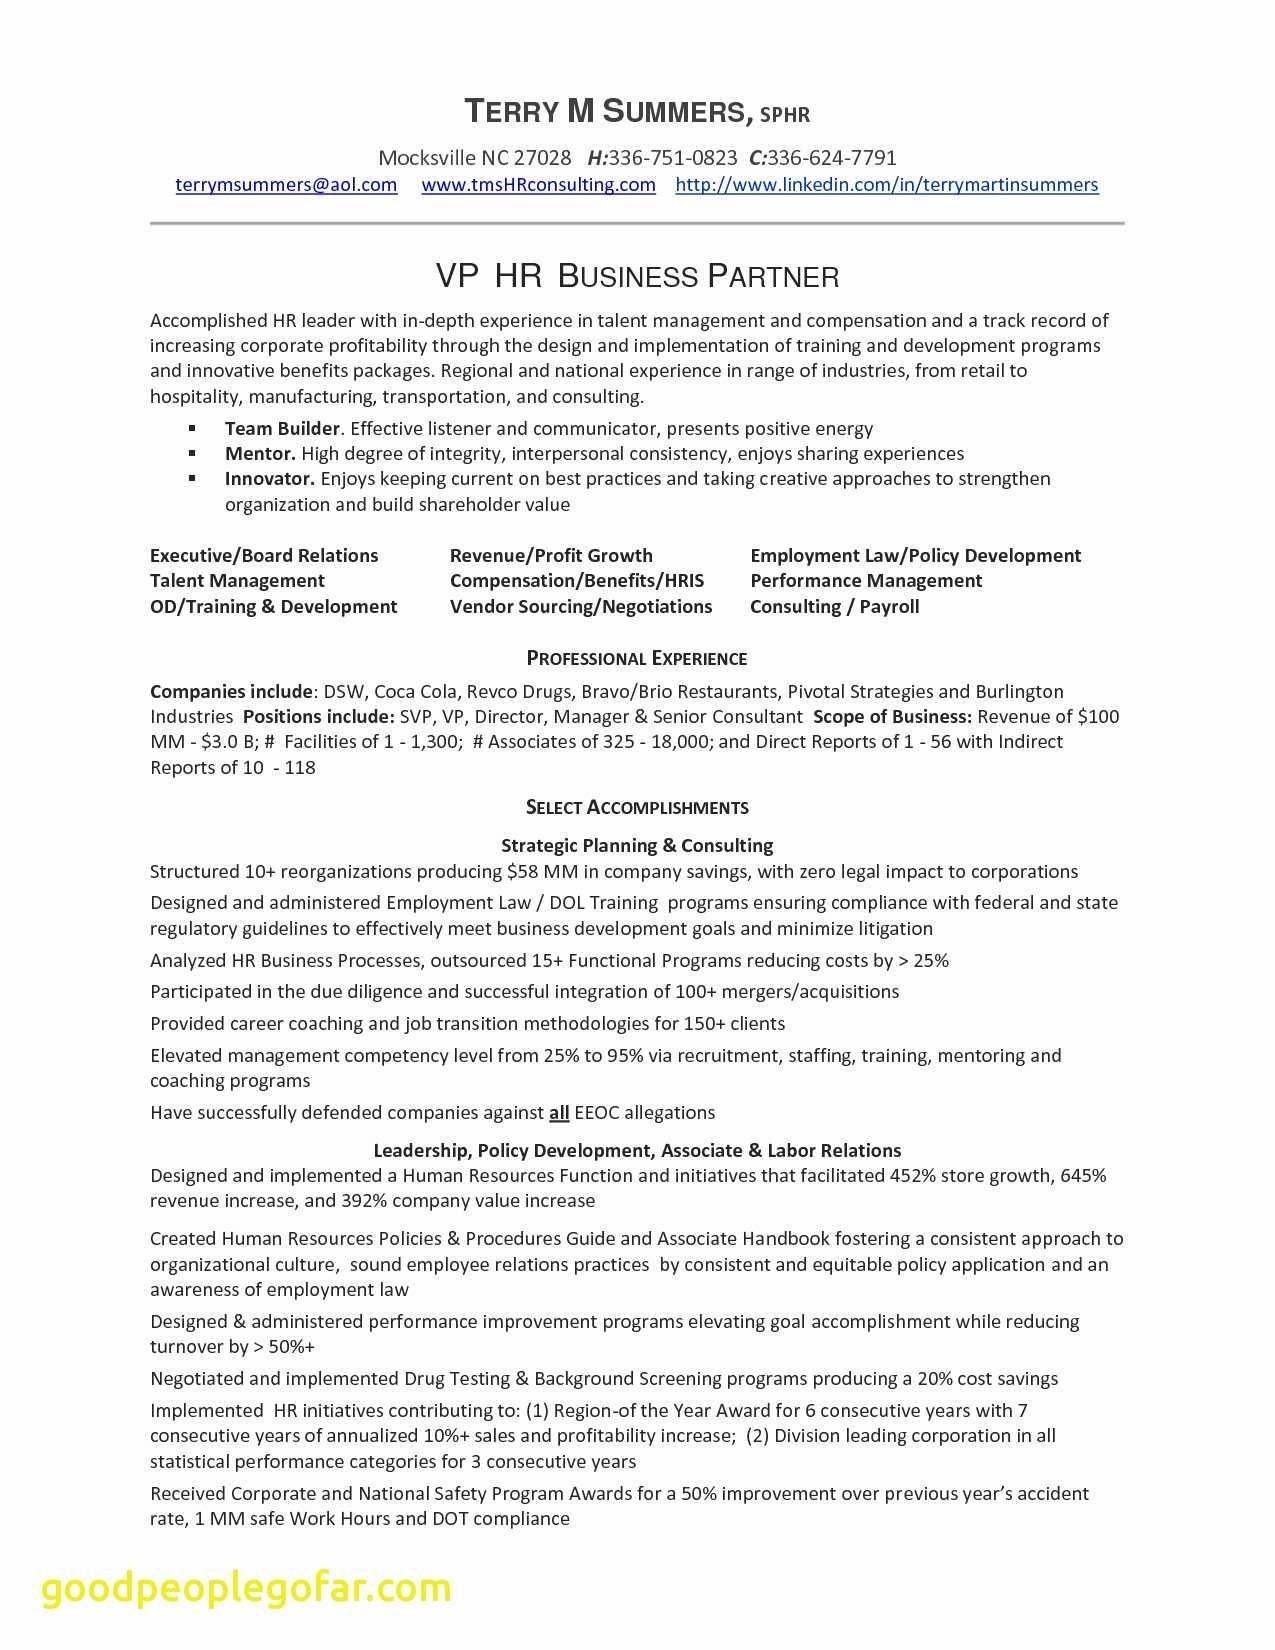 Cover Letter Template Restaurant - Cover Letter for attorney Job Save Job Application Letter format